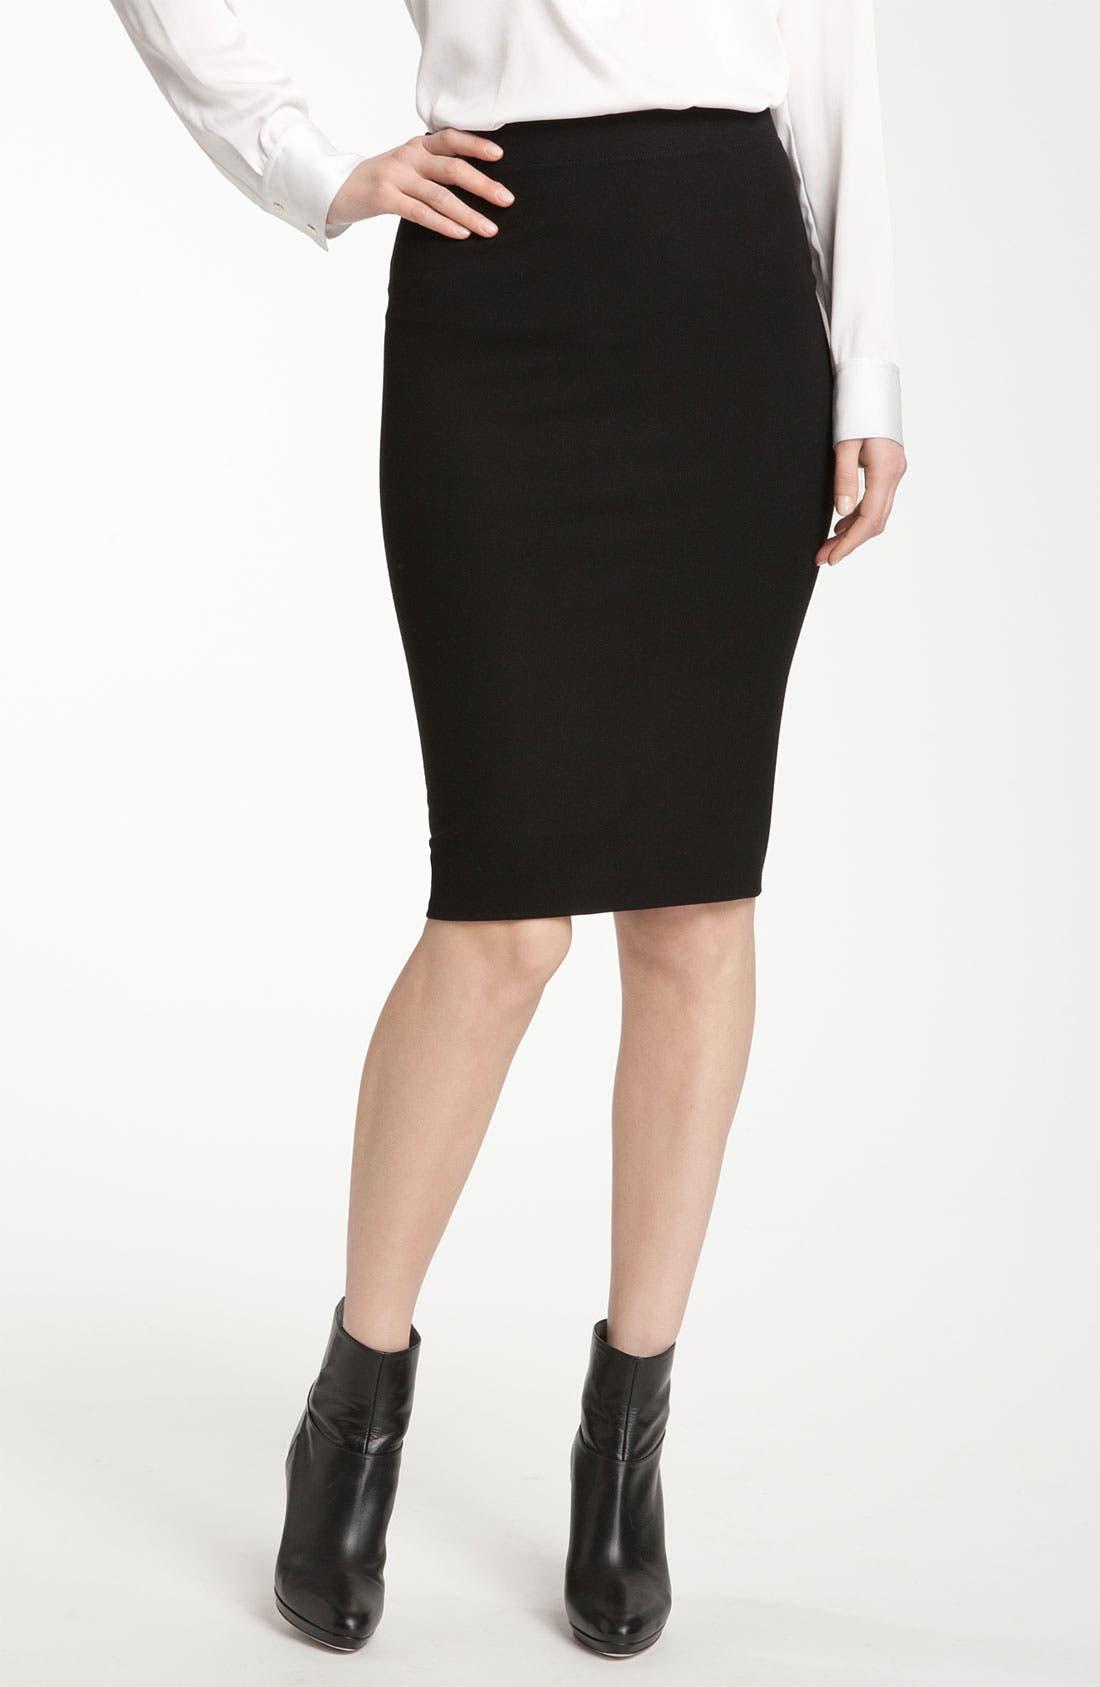 Alternate Image 1 Selected - Vince Knit Pencil Skirt